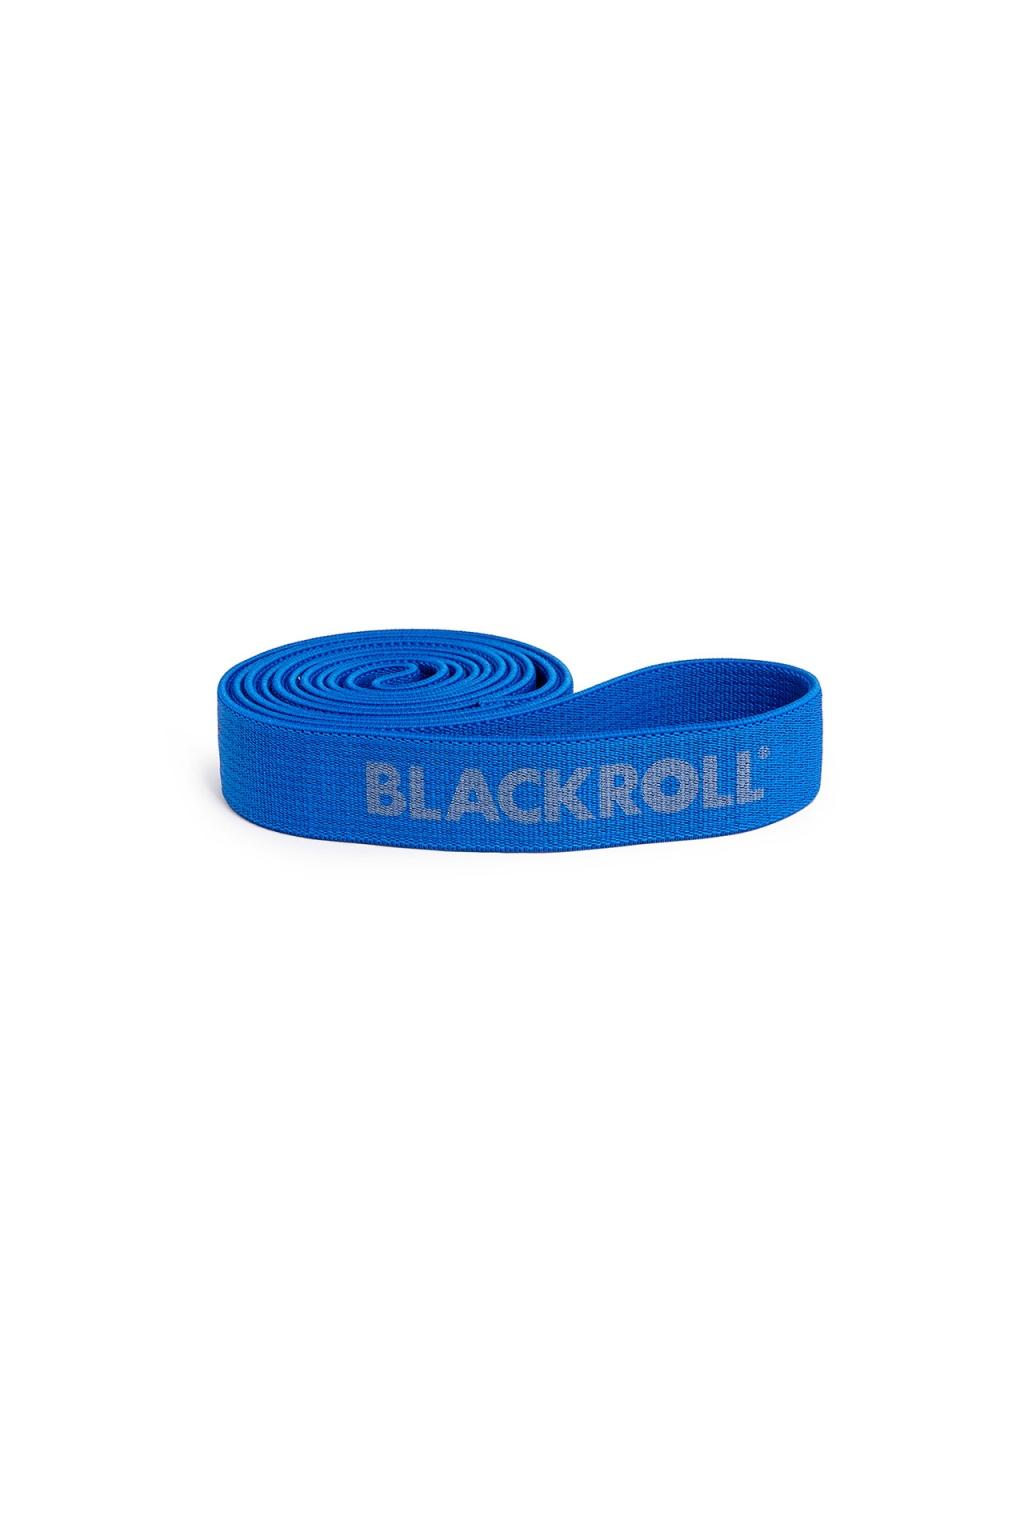 blackroll super band blue wien 1080 fengbao shop training kraft